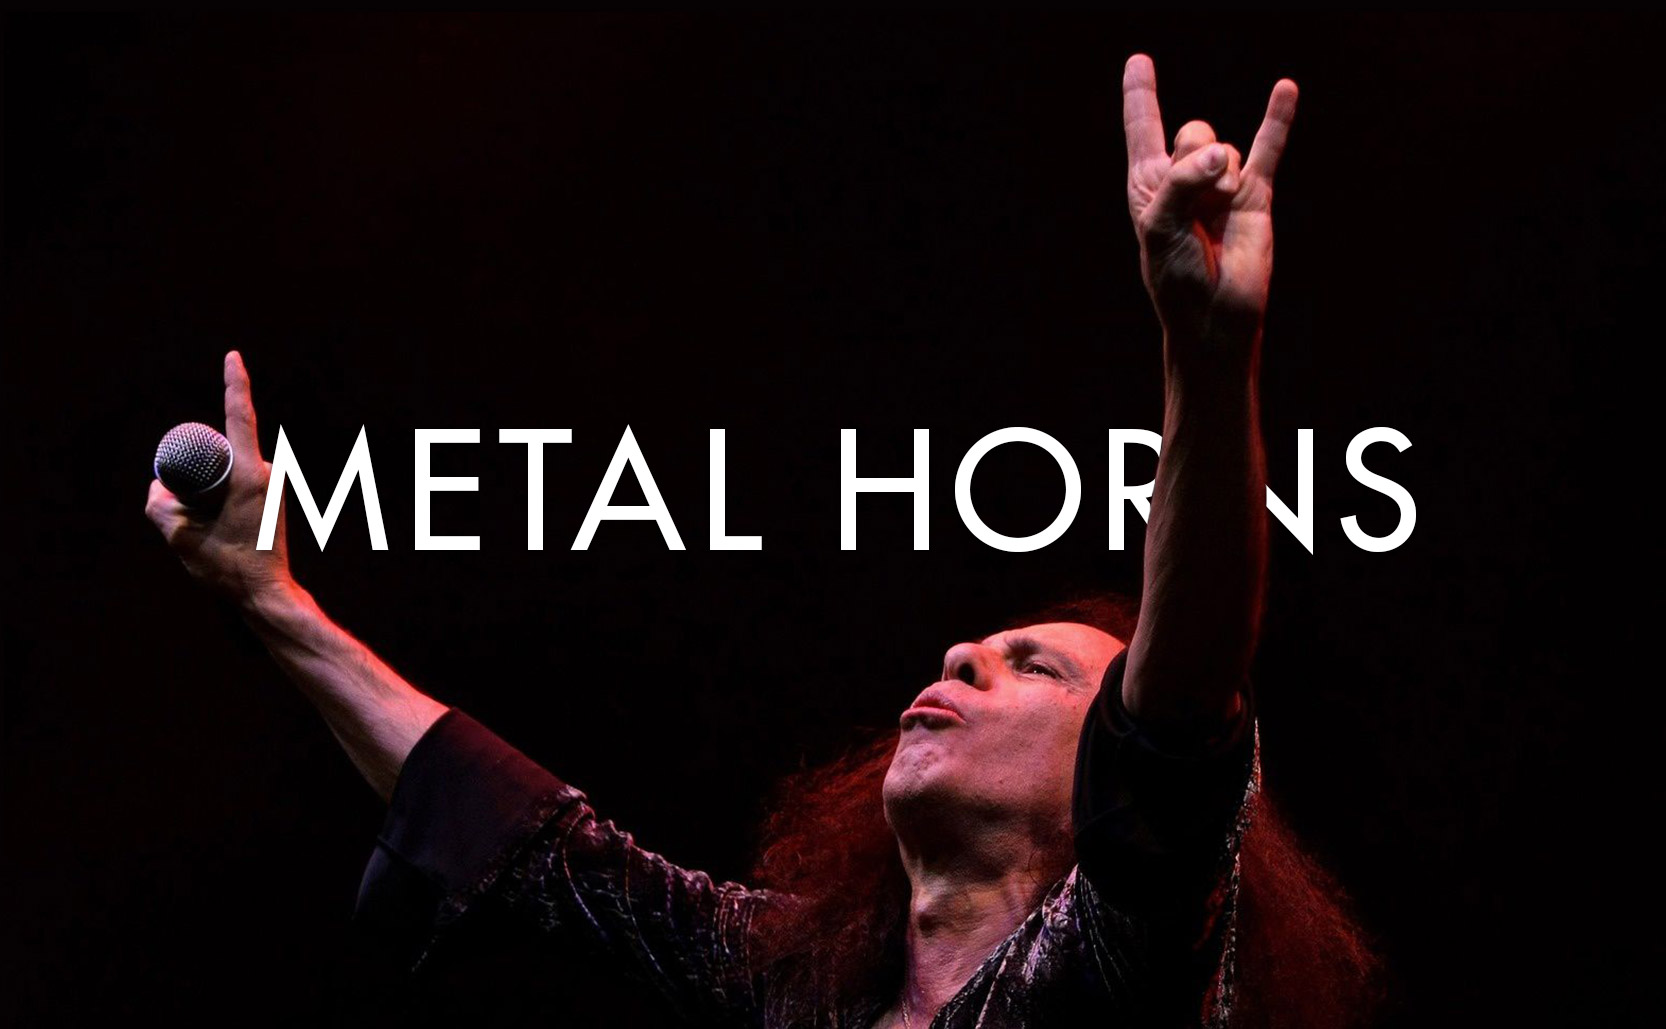 Metal Horns